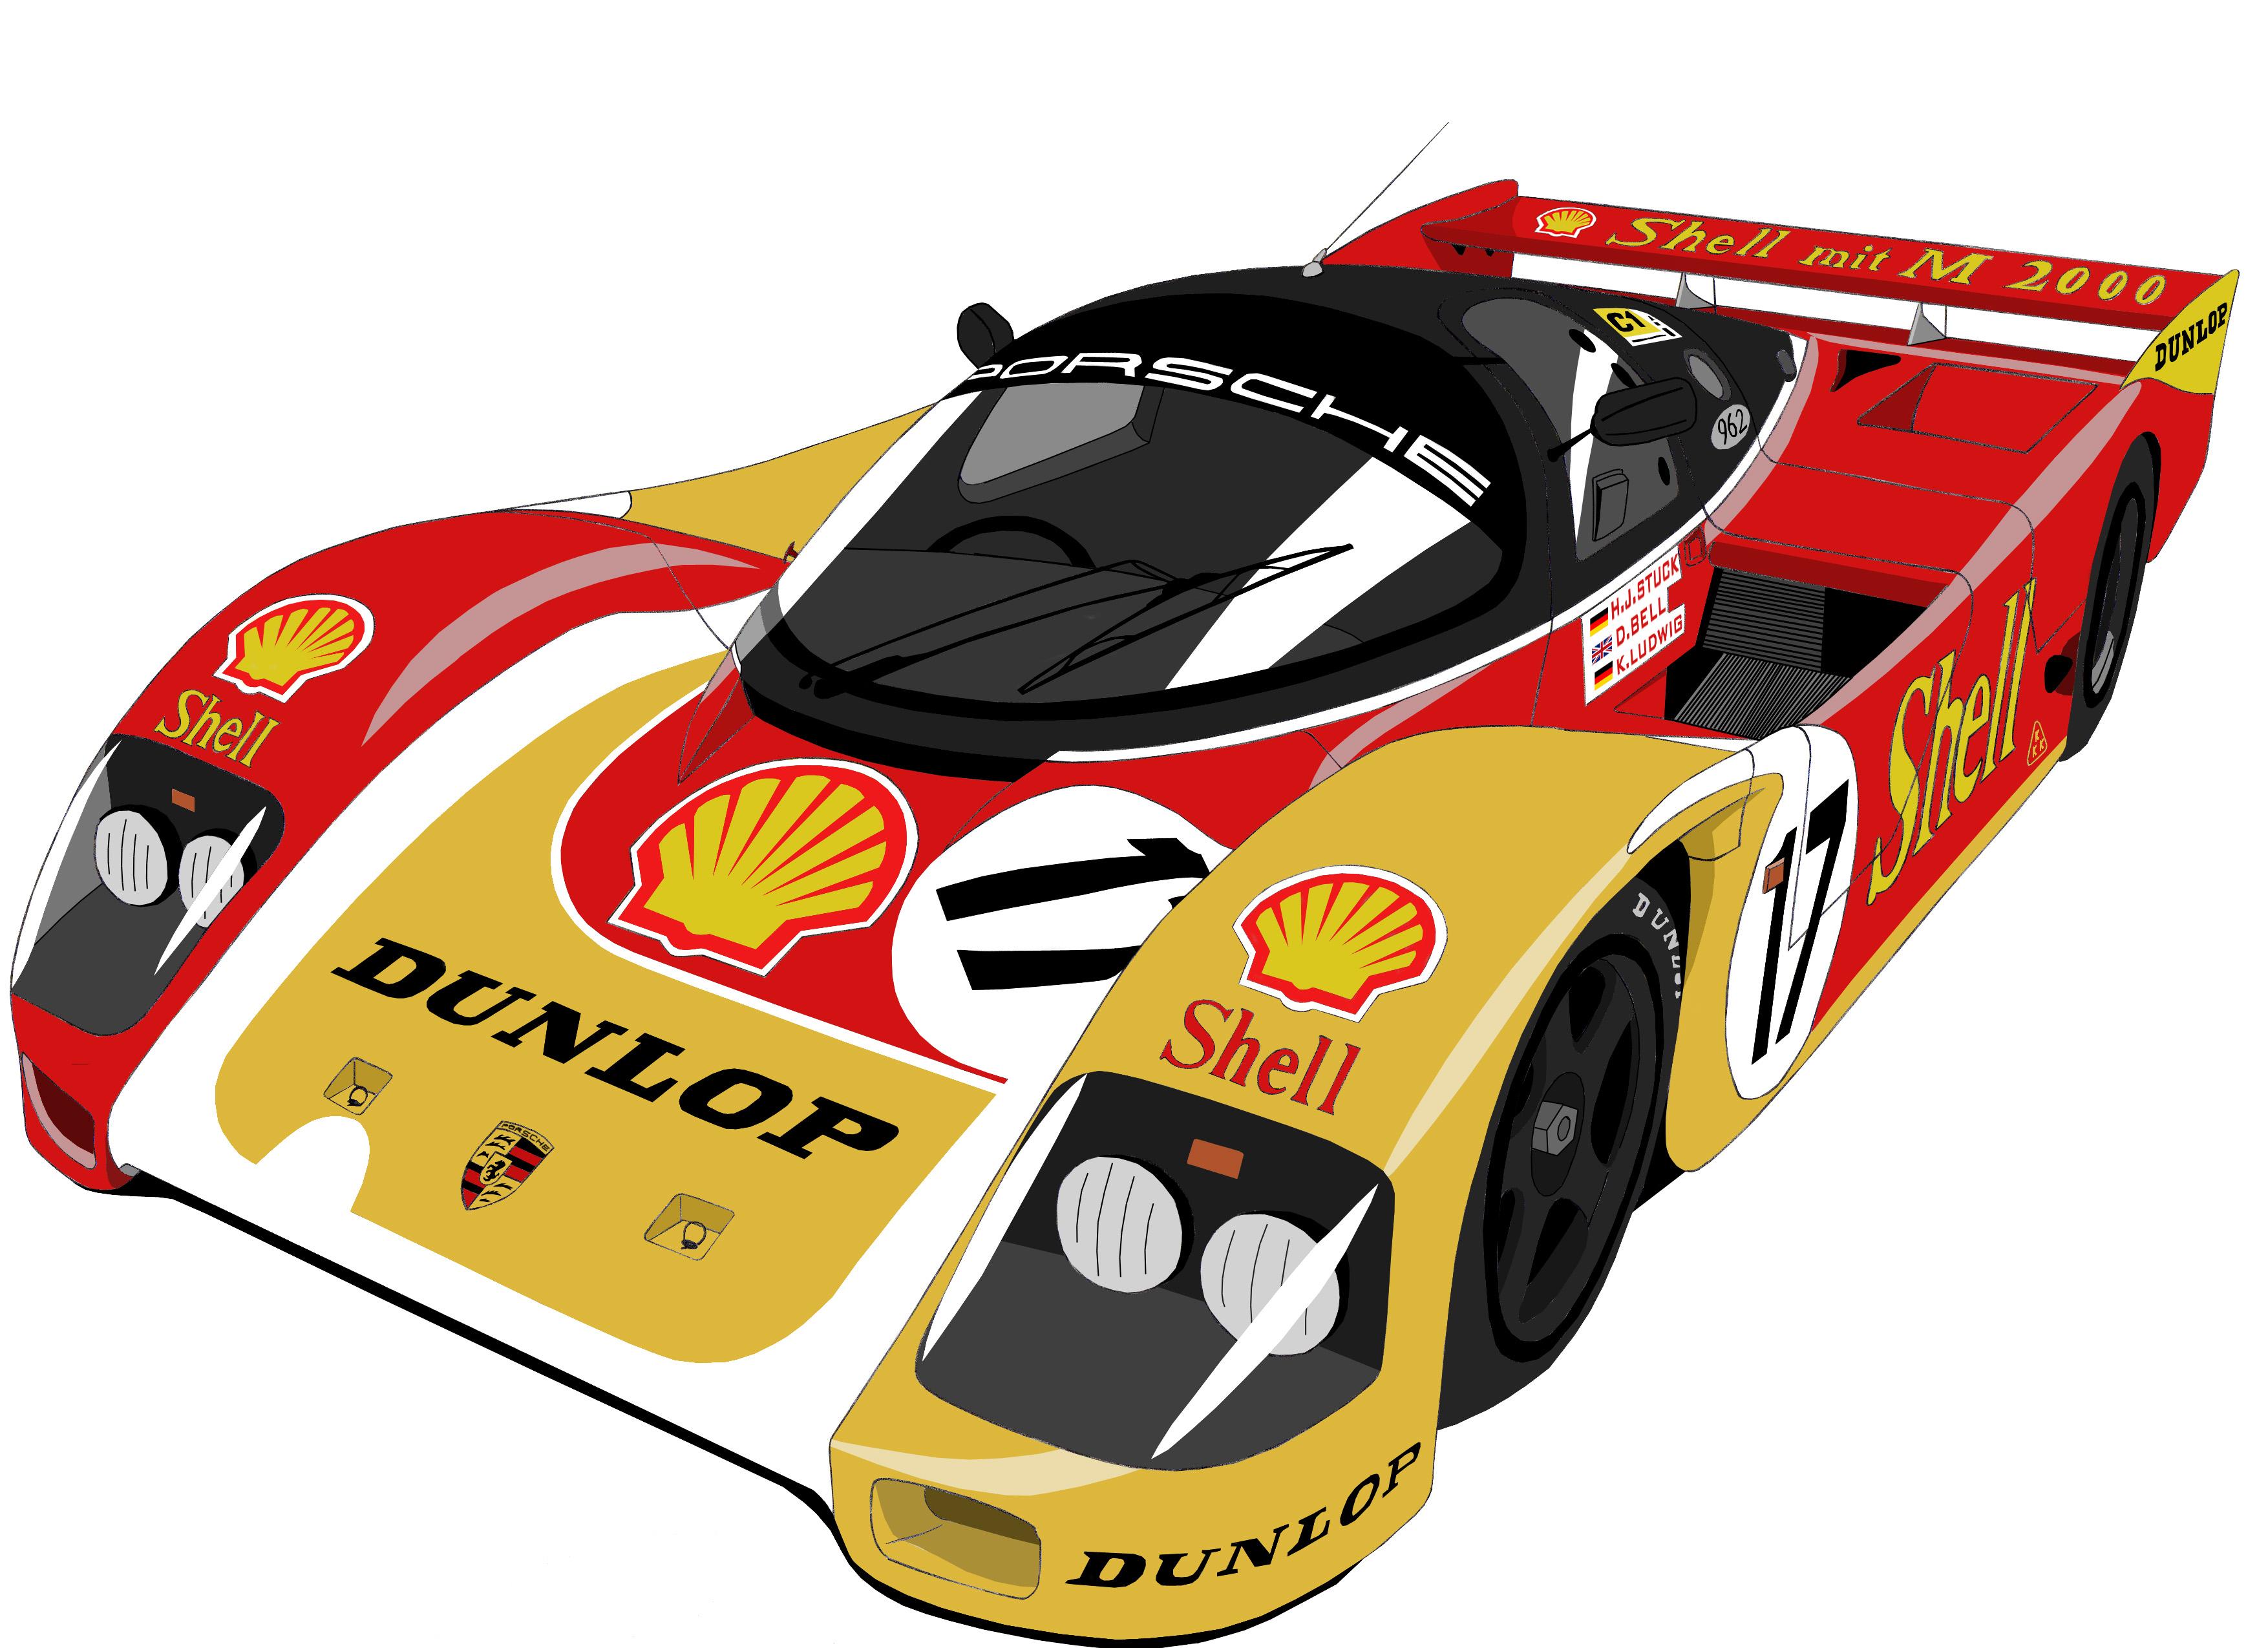 Dessin Porsche 962 couleur - PencilDrawing.fr